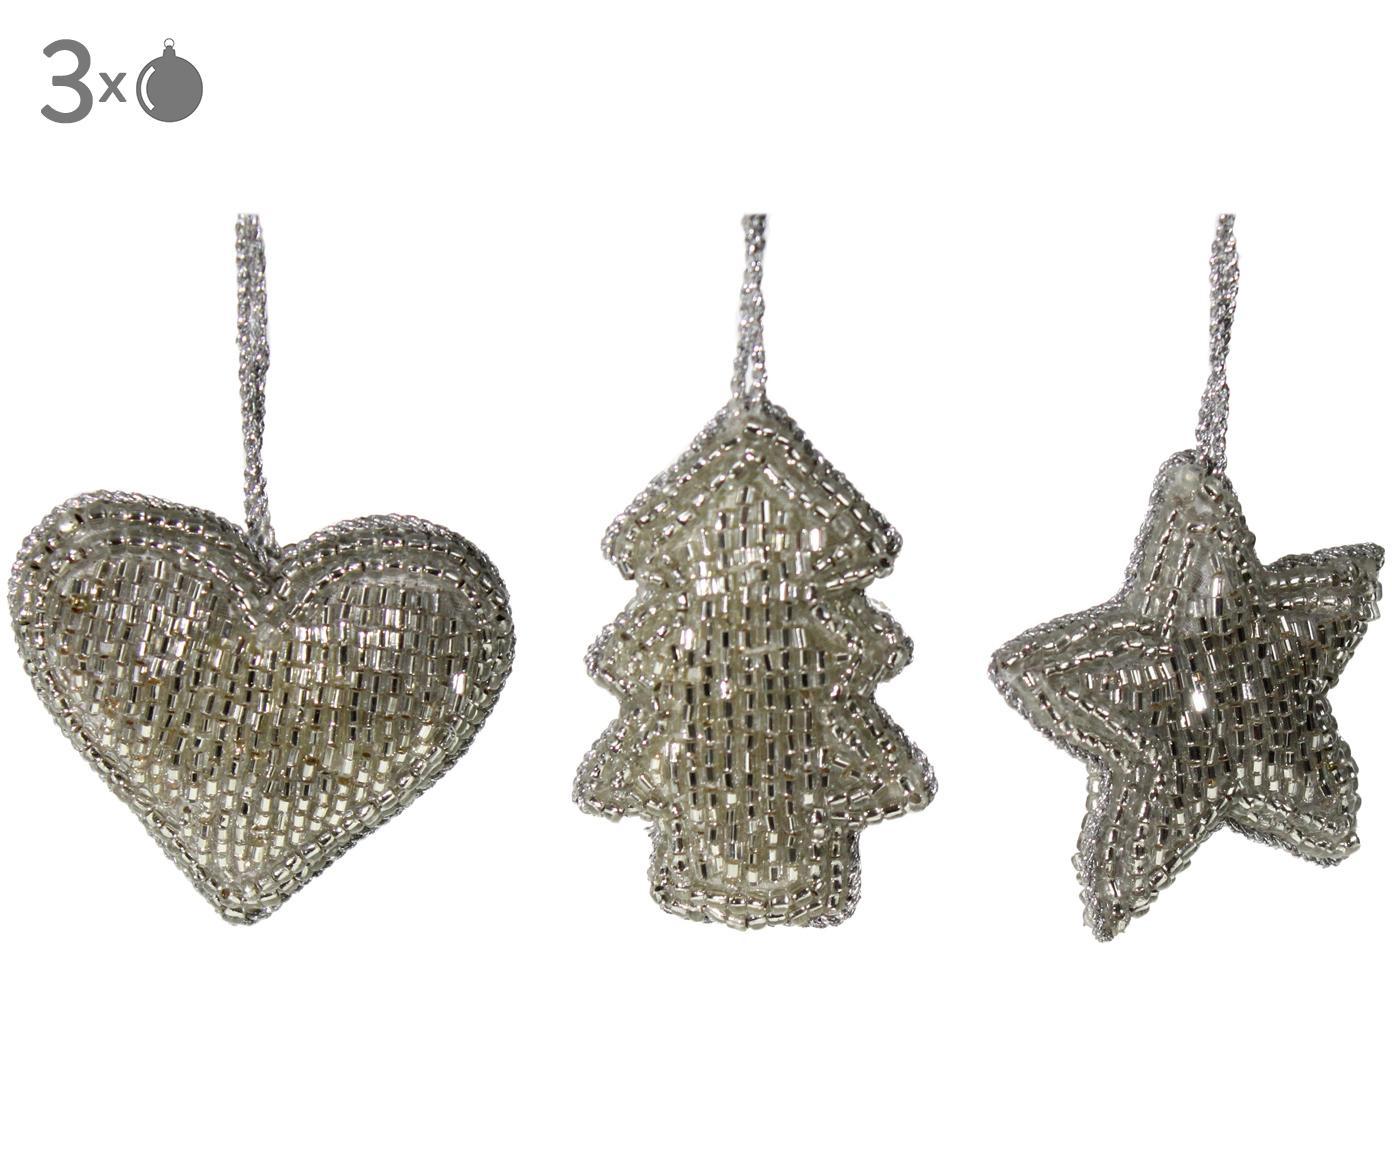 Set ciondoli Pearl, 3 pz., Plastica, Argento, L 6 x A 6 cm